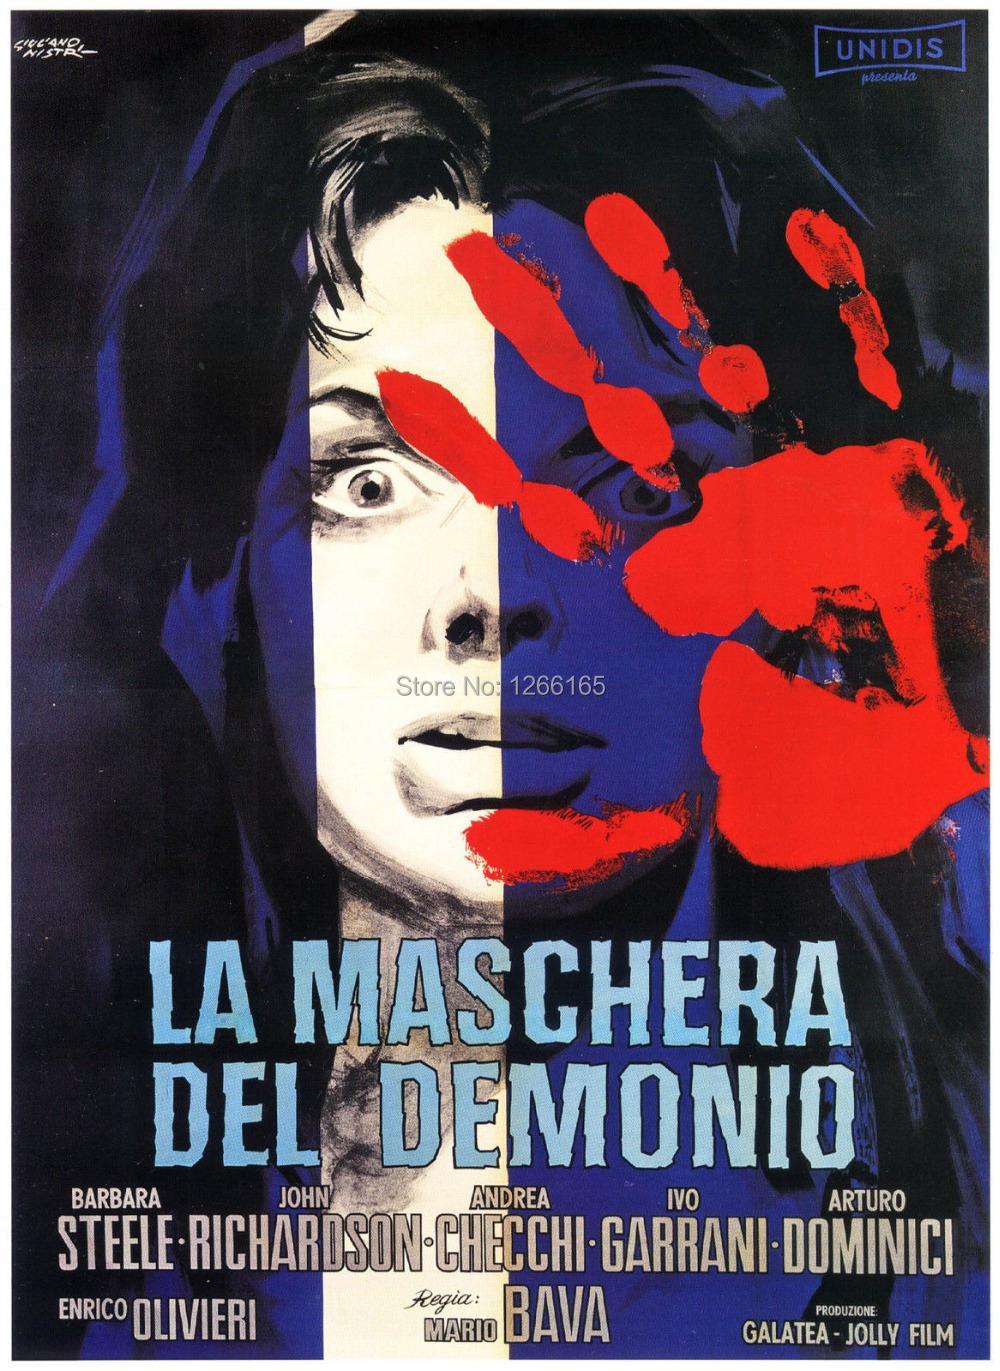 BLACK SUNDAY Movie Poster 1960 <font><b>Italian</b></font> Horror Print Silk poster <font><b>Home</b></font> <font><b>Decoration</b></font> 12x18 24x36 inch